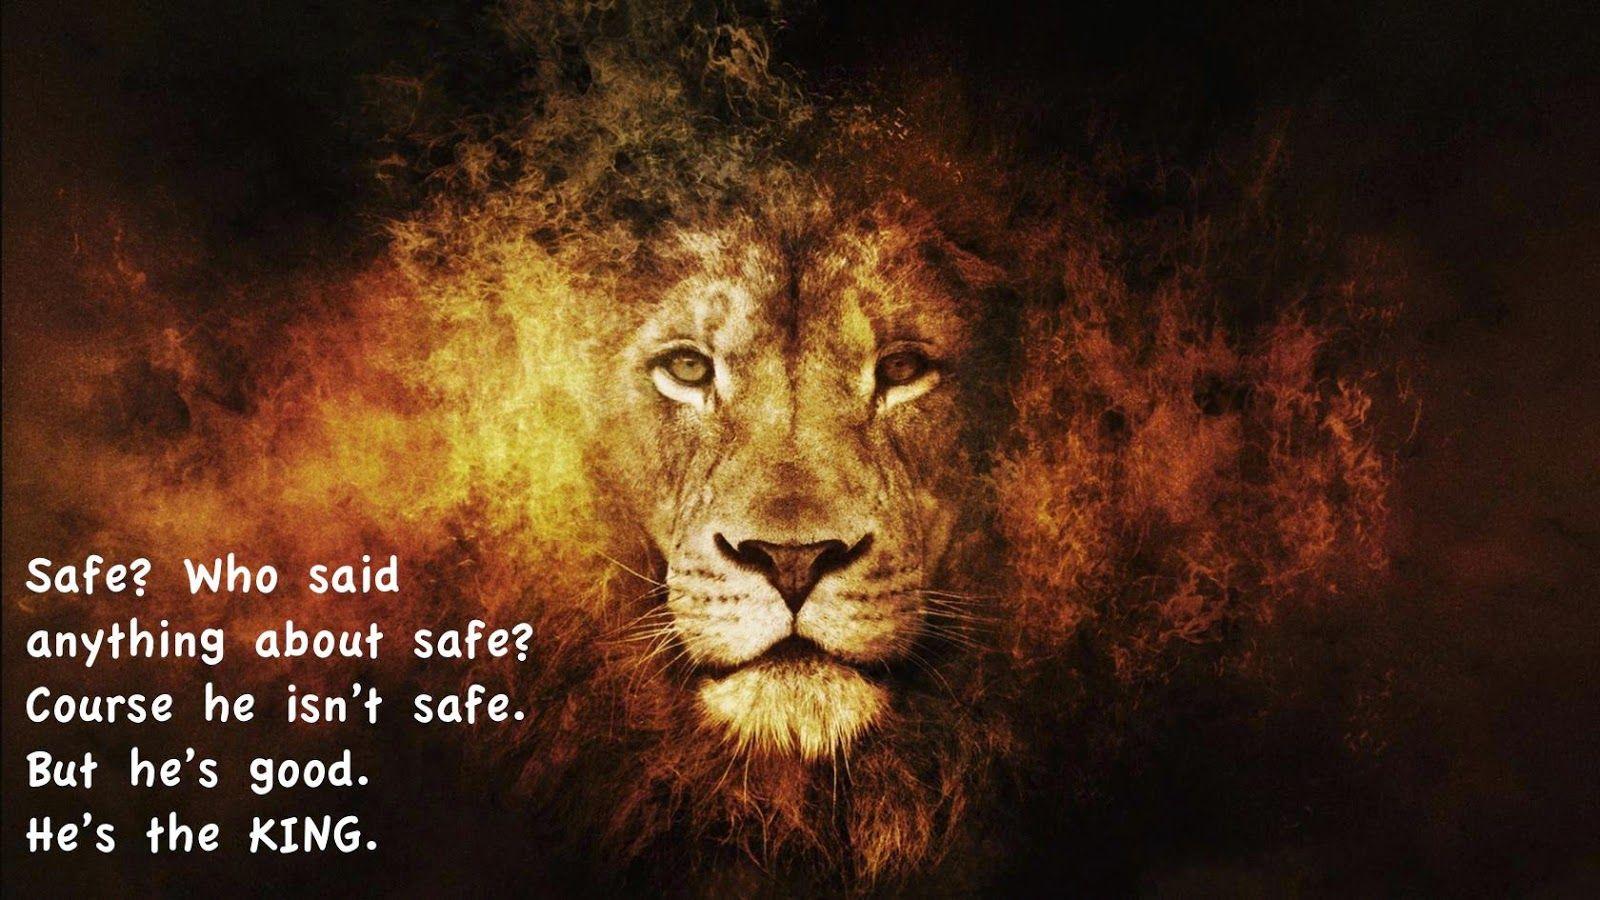 C.S. Lewis, Aslan not a tame lion, Aslan not safe but good | Lion artwork,  Lion hd wallpaper, Lion pictures